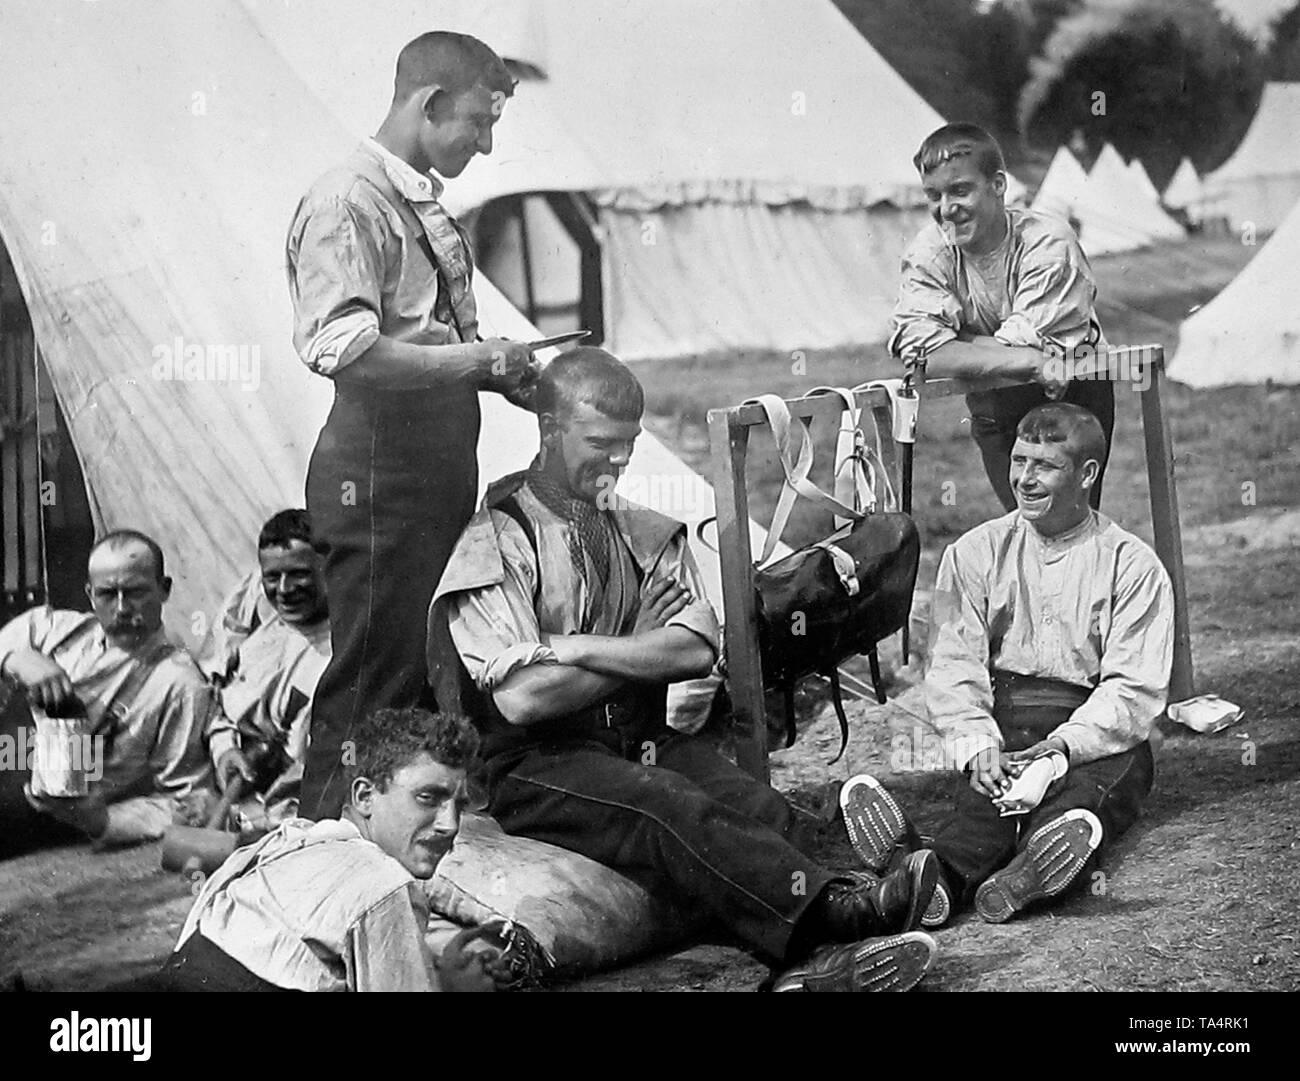 British Army Recruits hair cut - Stock Image